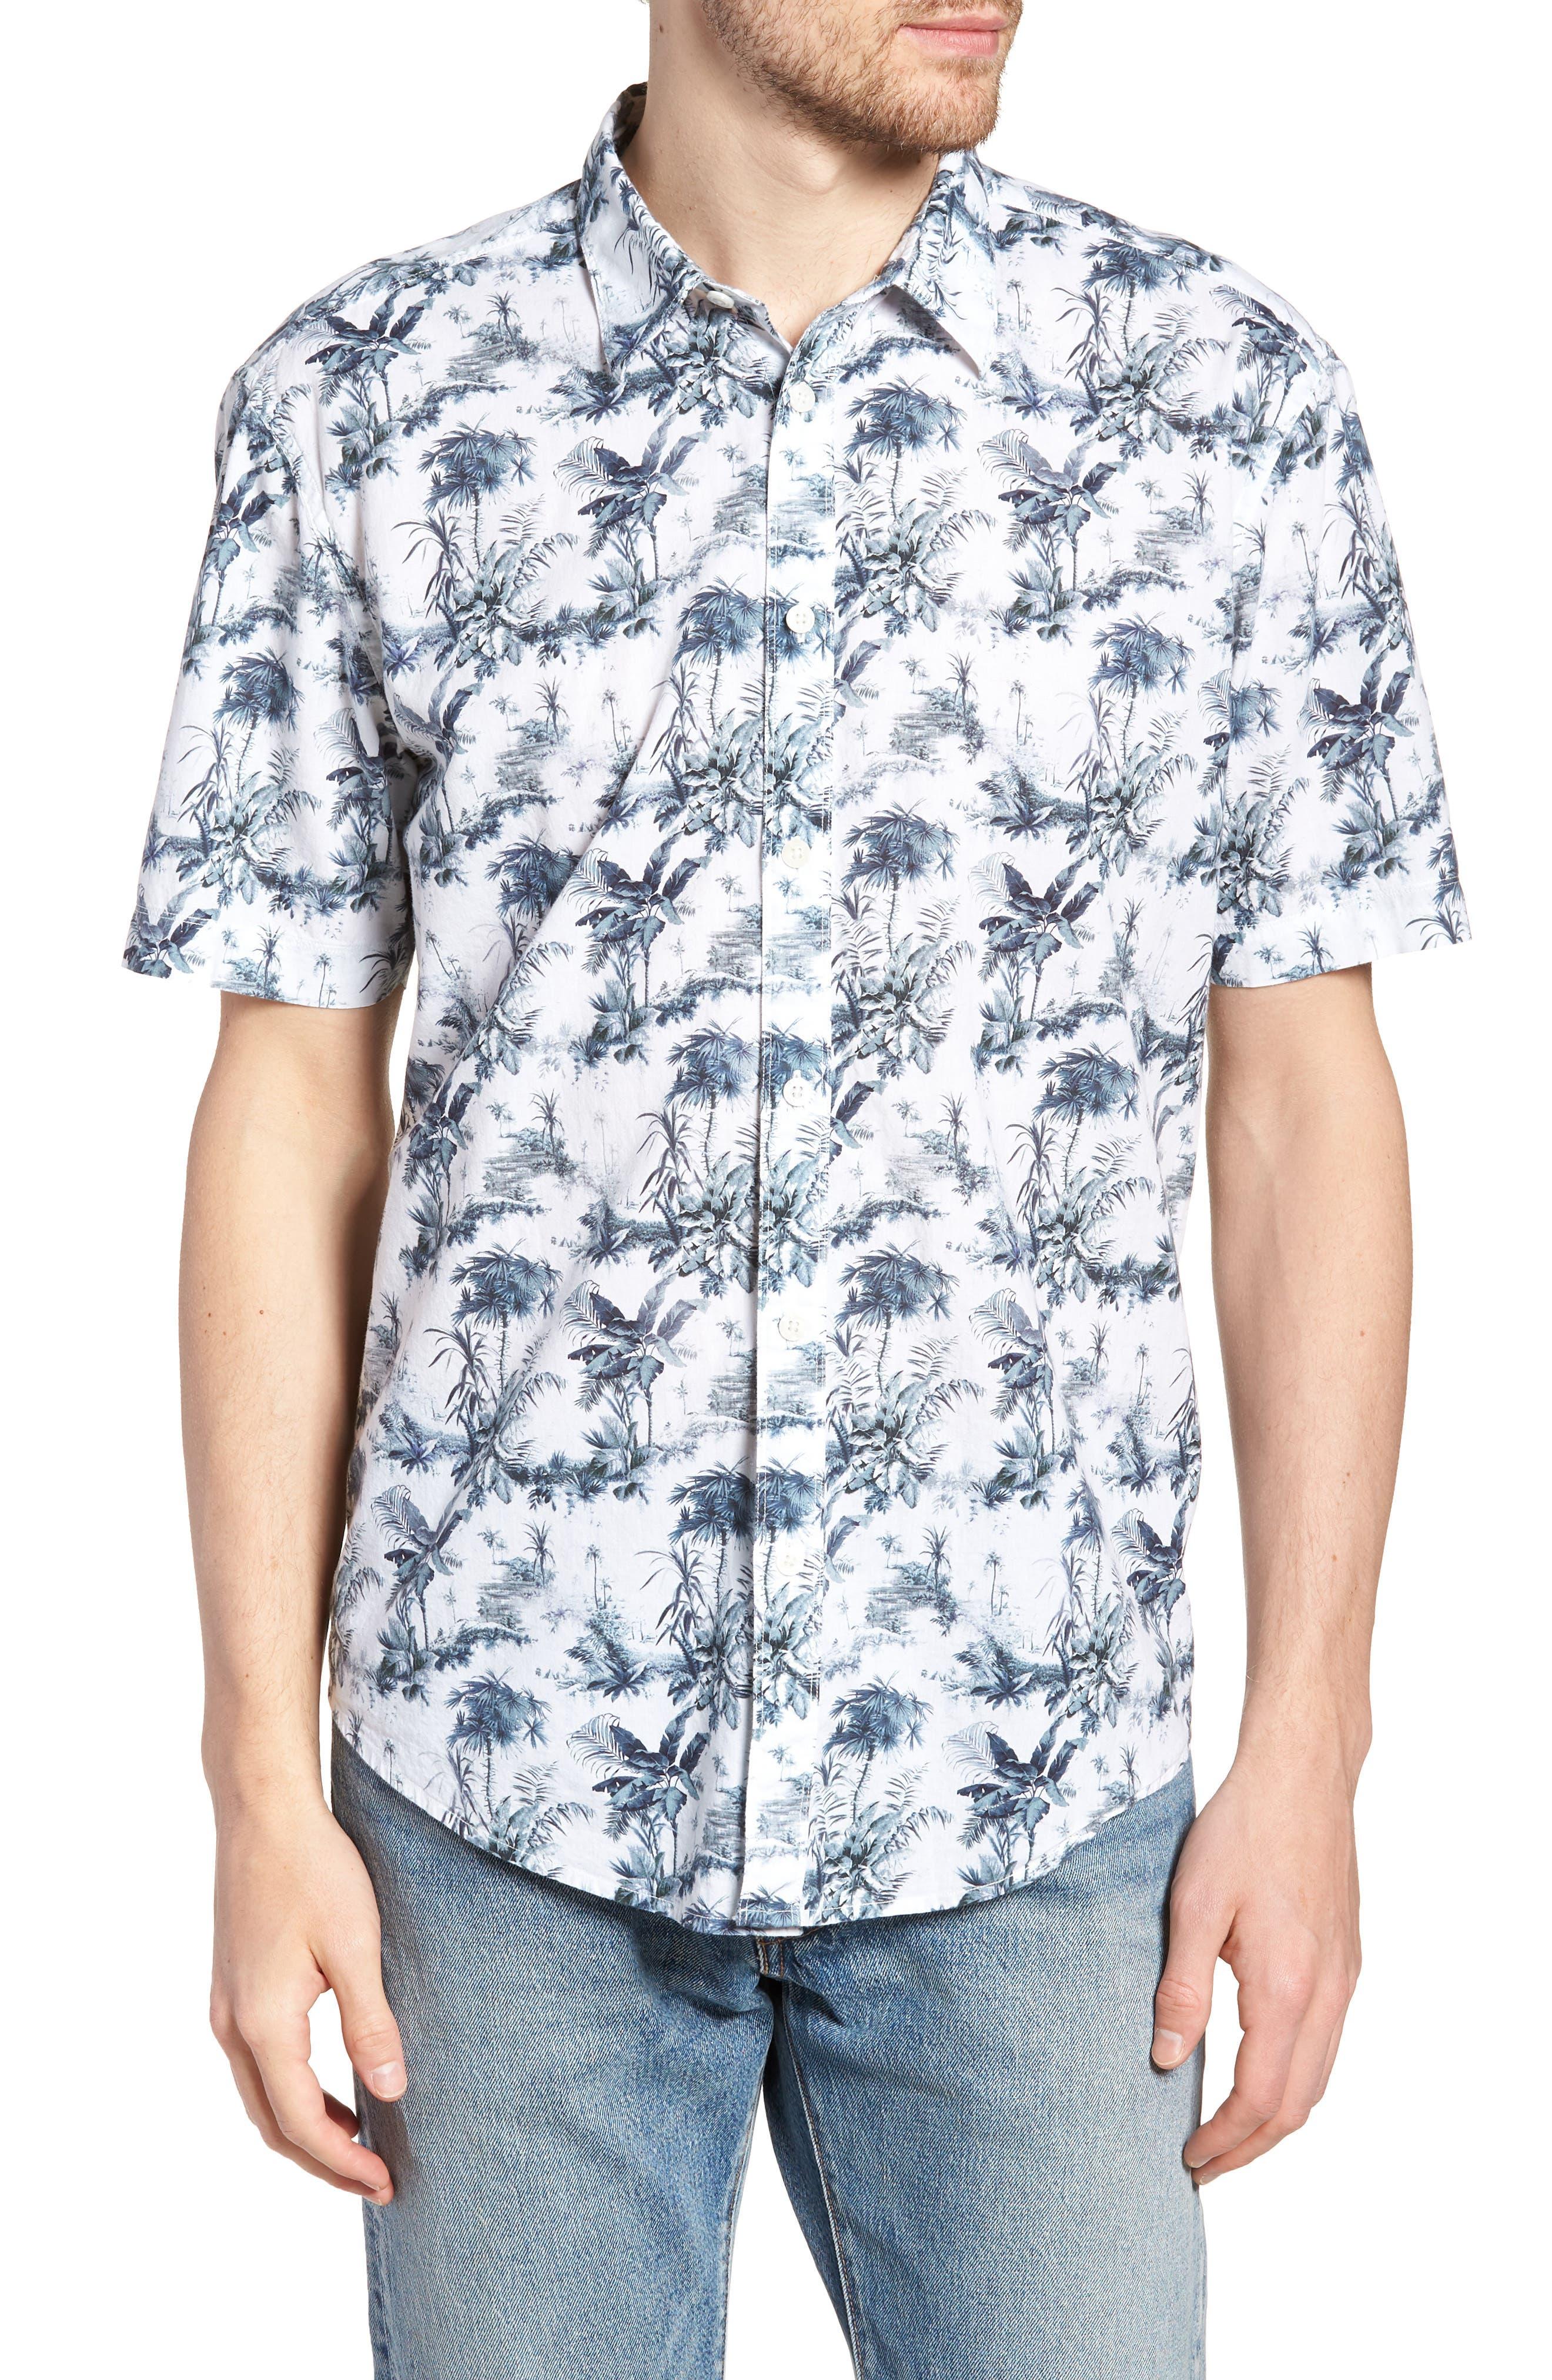 Waiki Regular Fit Short Sleeve Sport Shirt,                             Main thumbnail 1, color,                             100